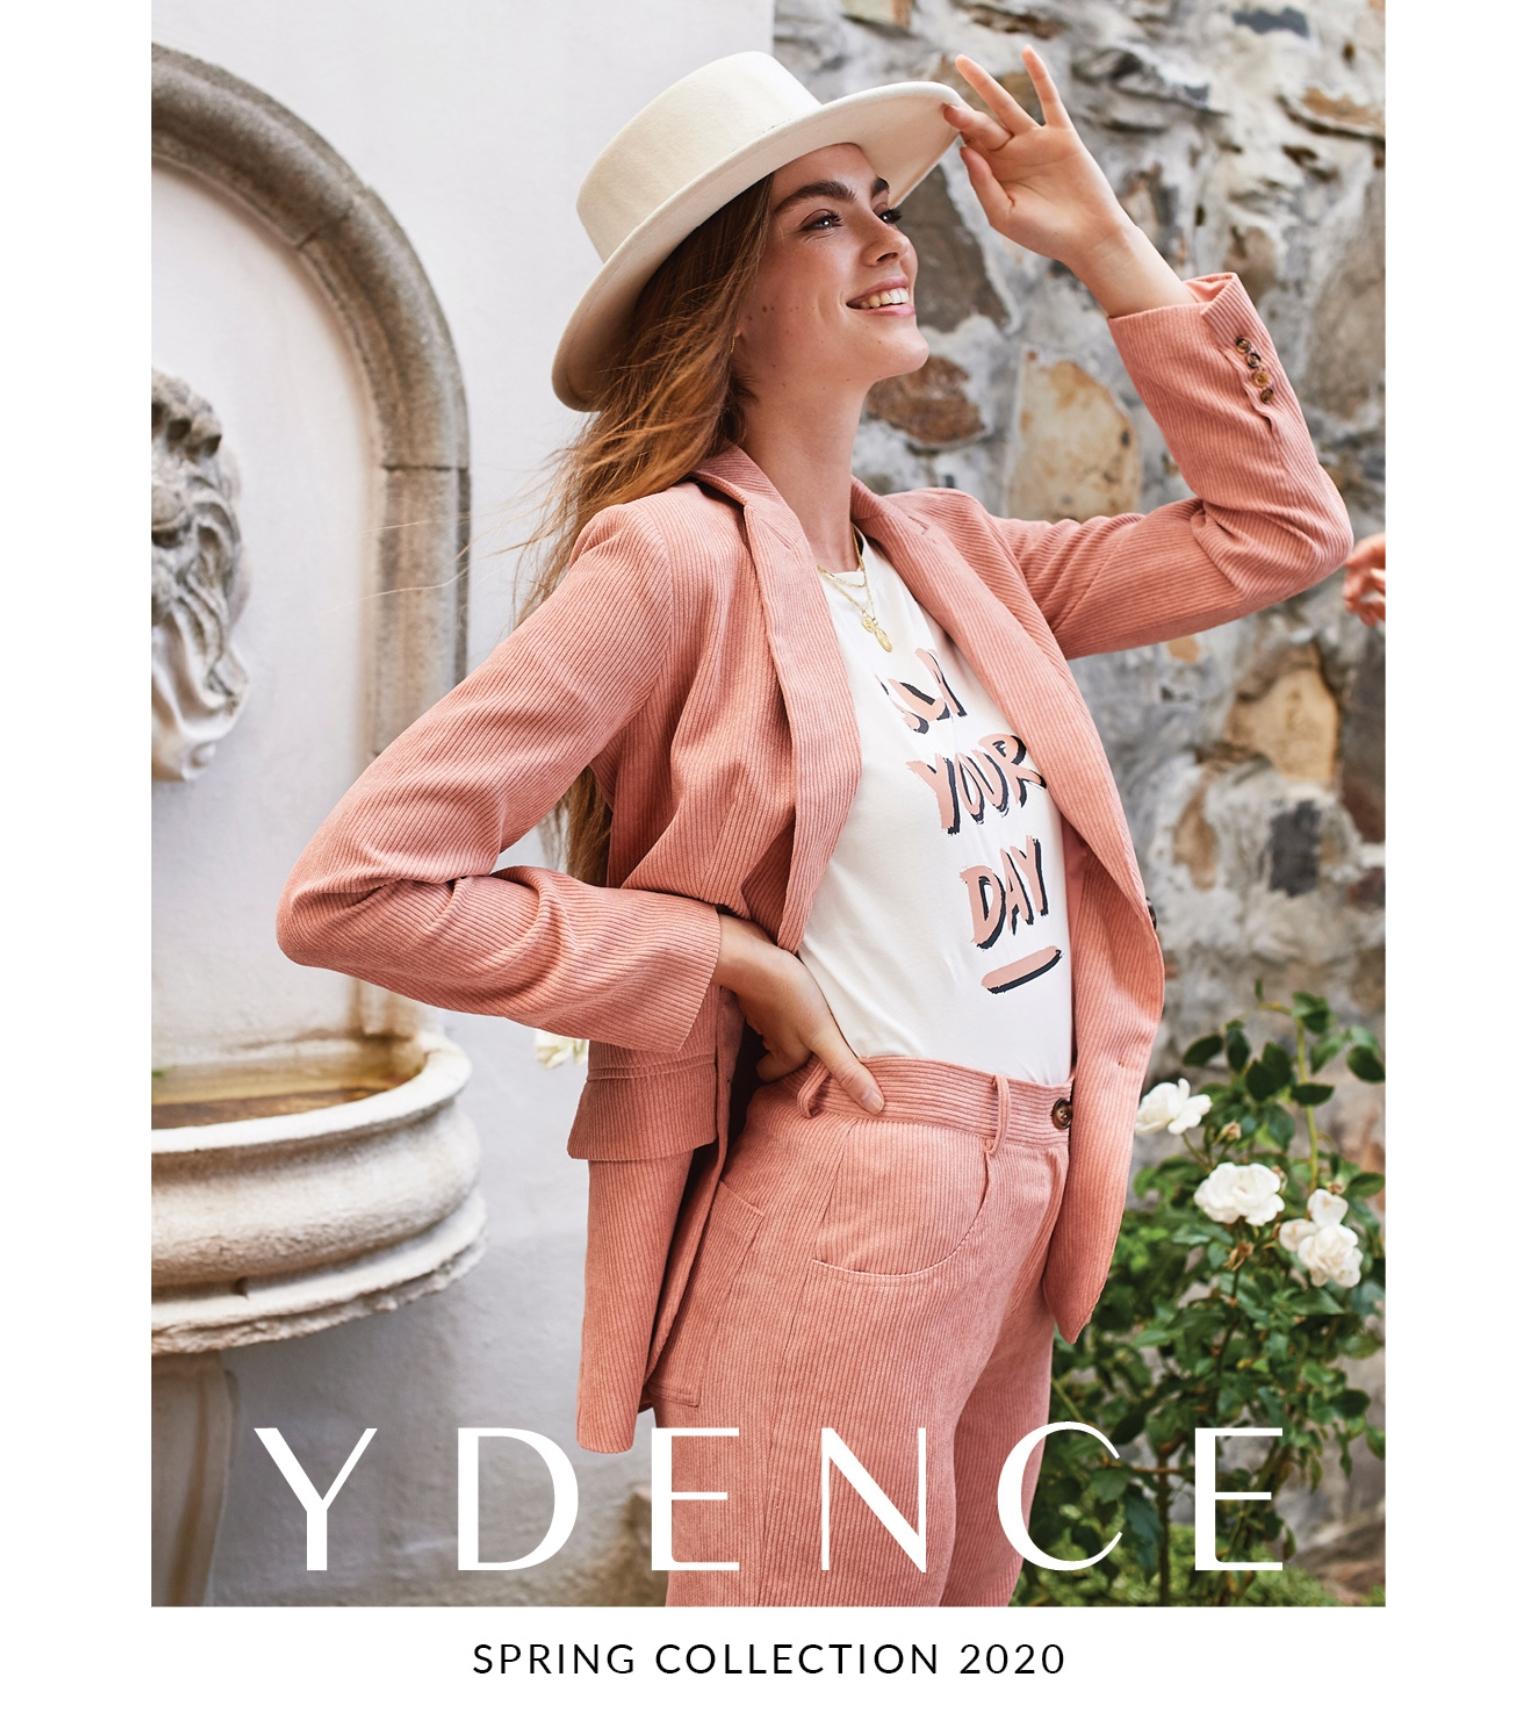 Ydence Spring